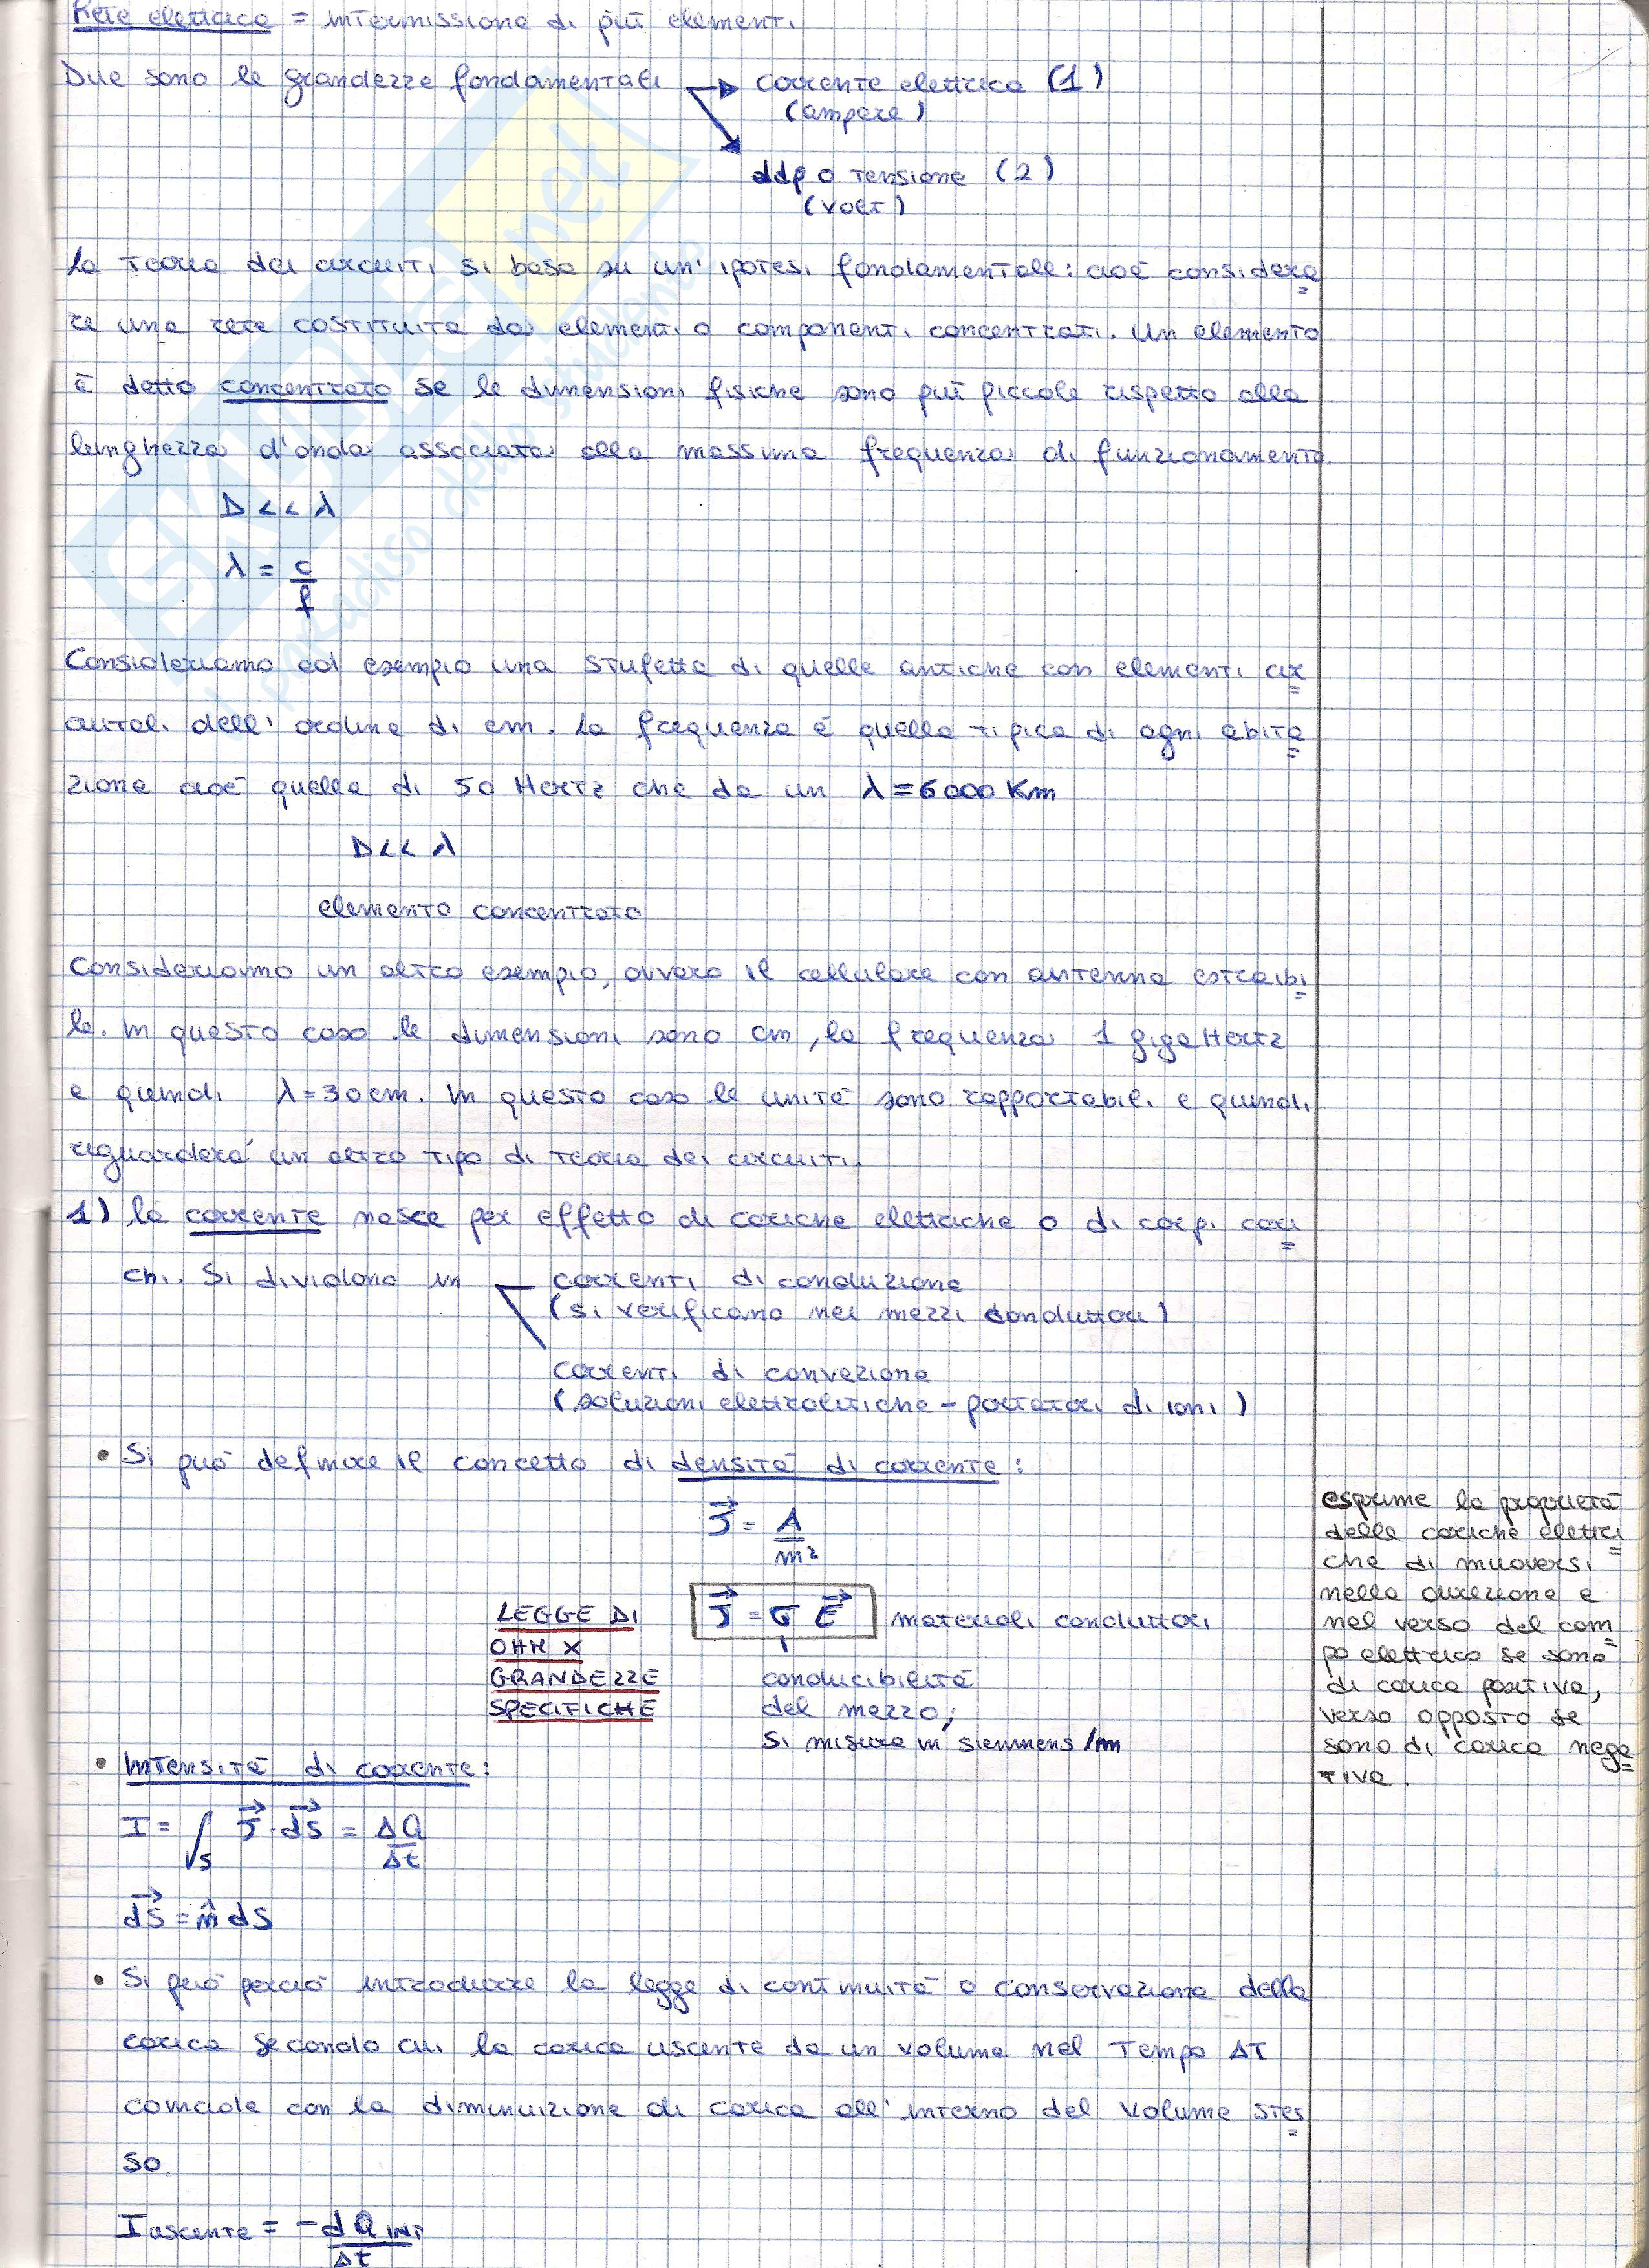 Elettrotecnica - Appunti Pag. 1